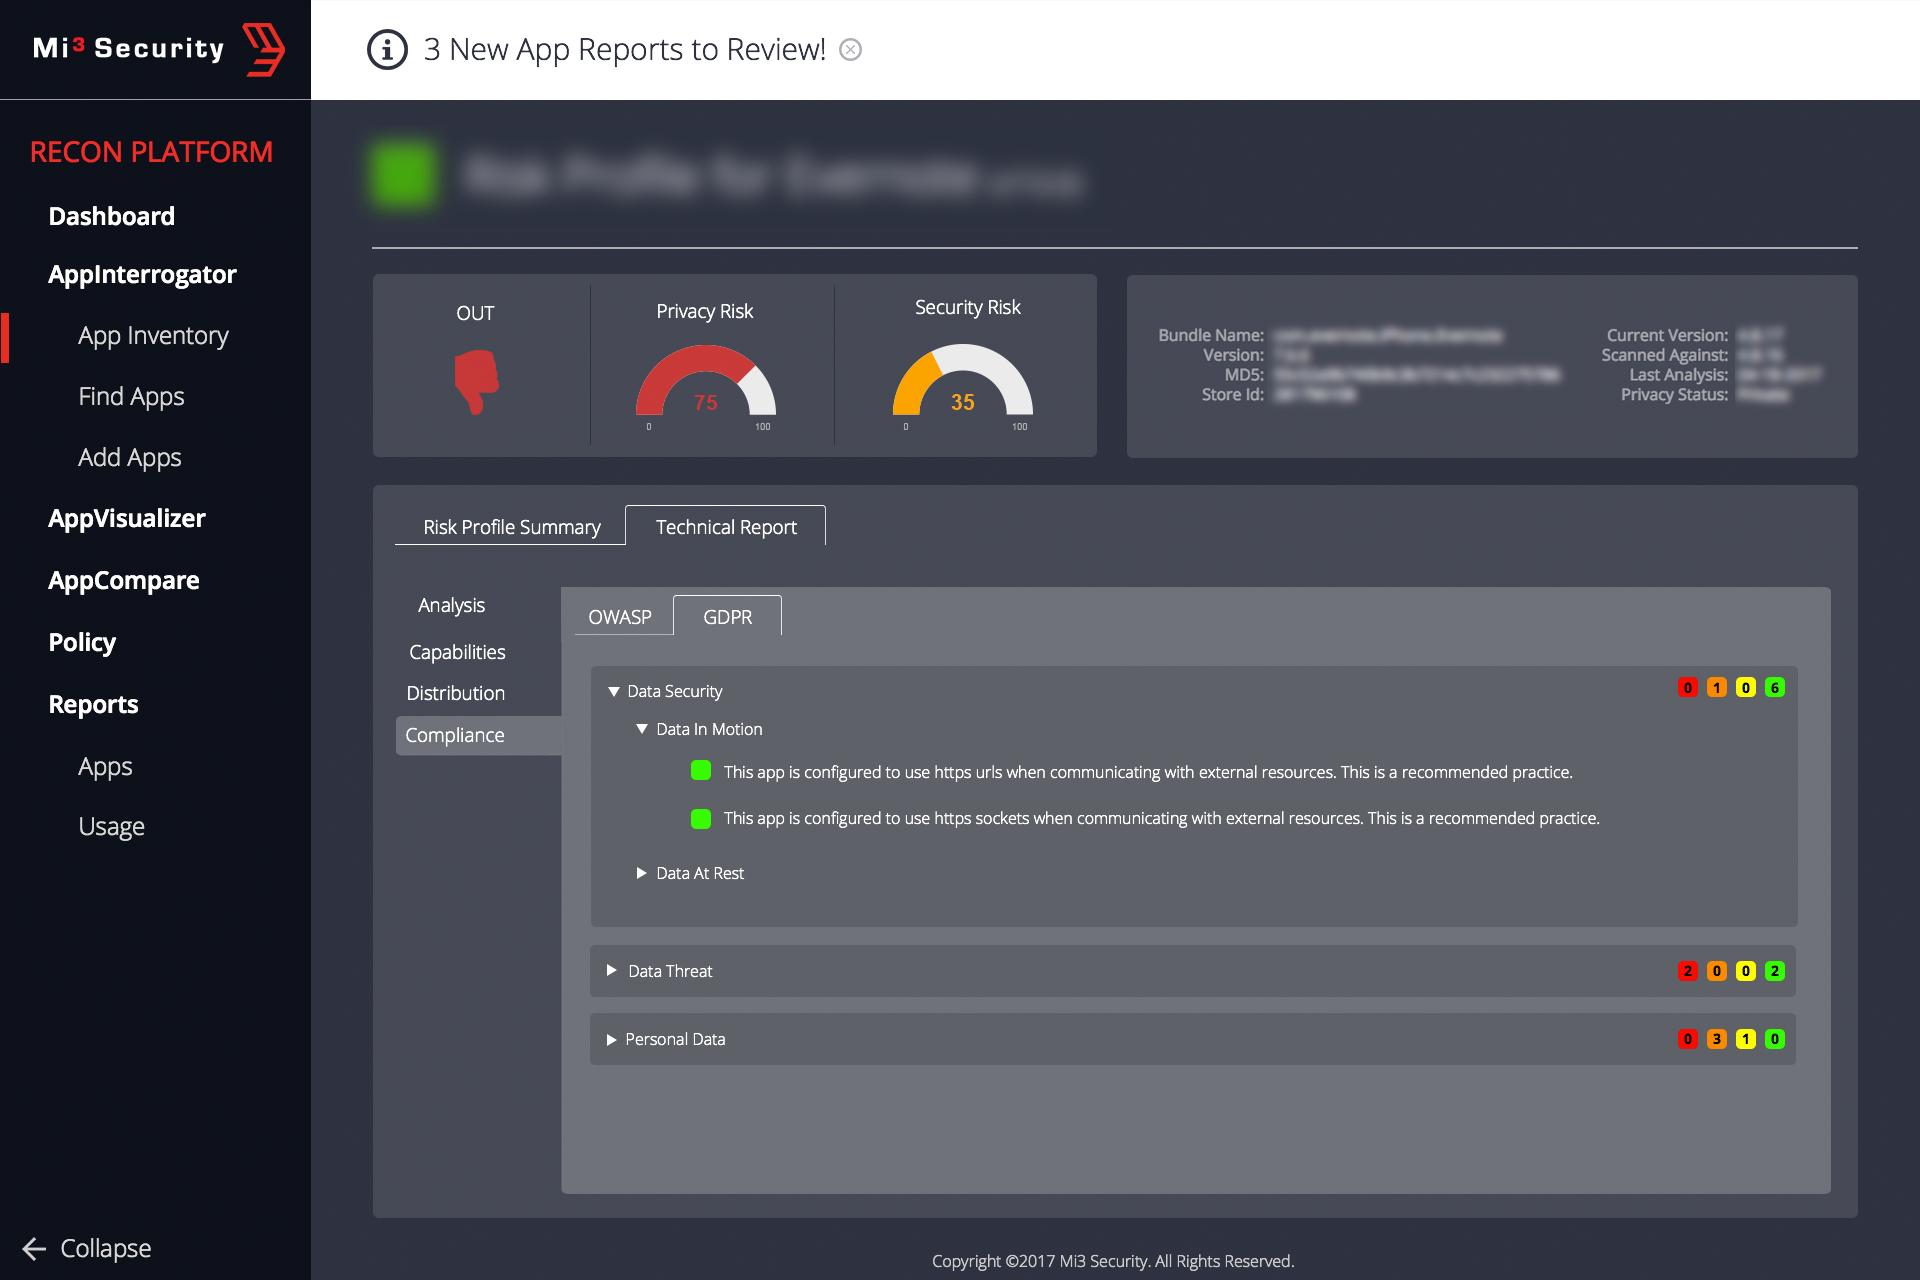 New-Portal-Report-GDPR-blurred.png